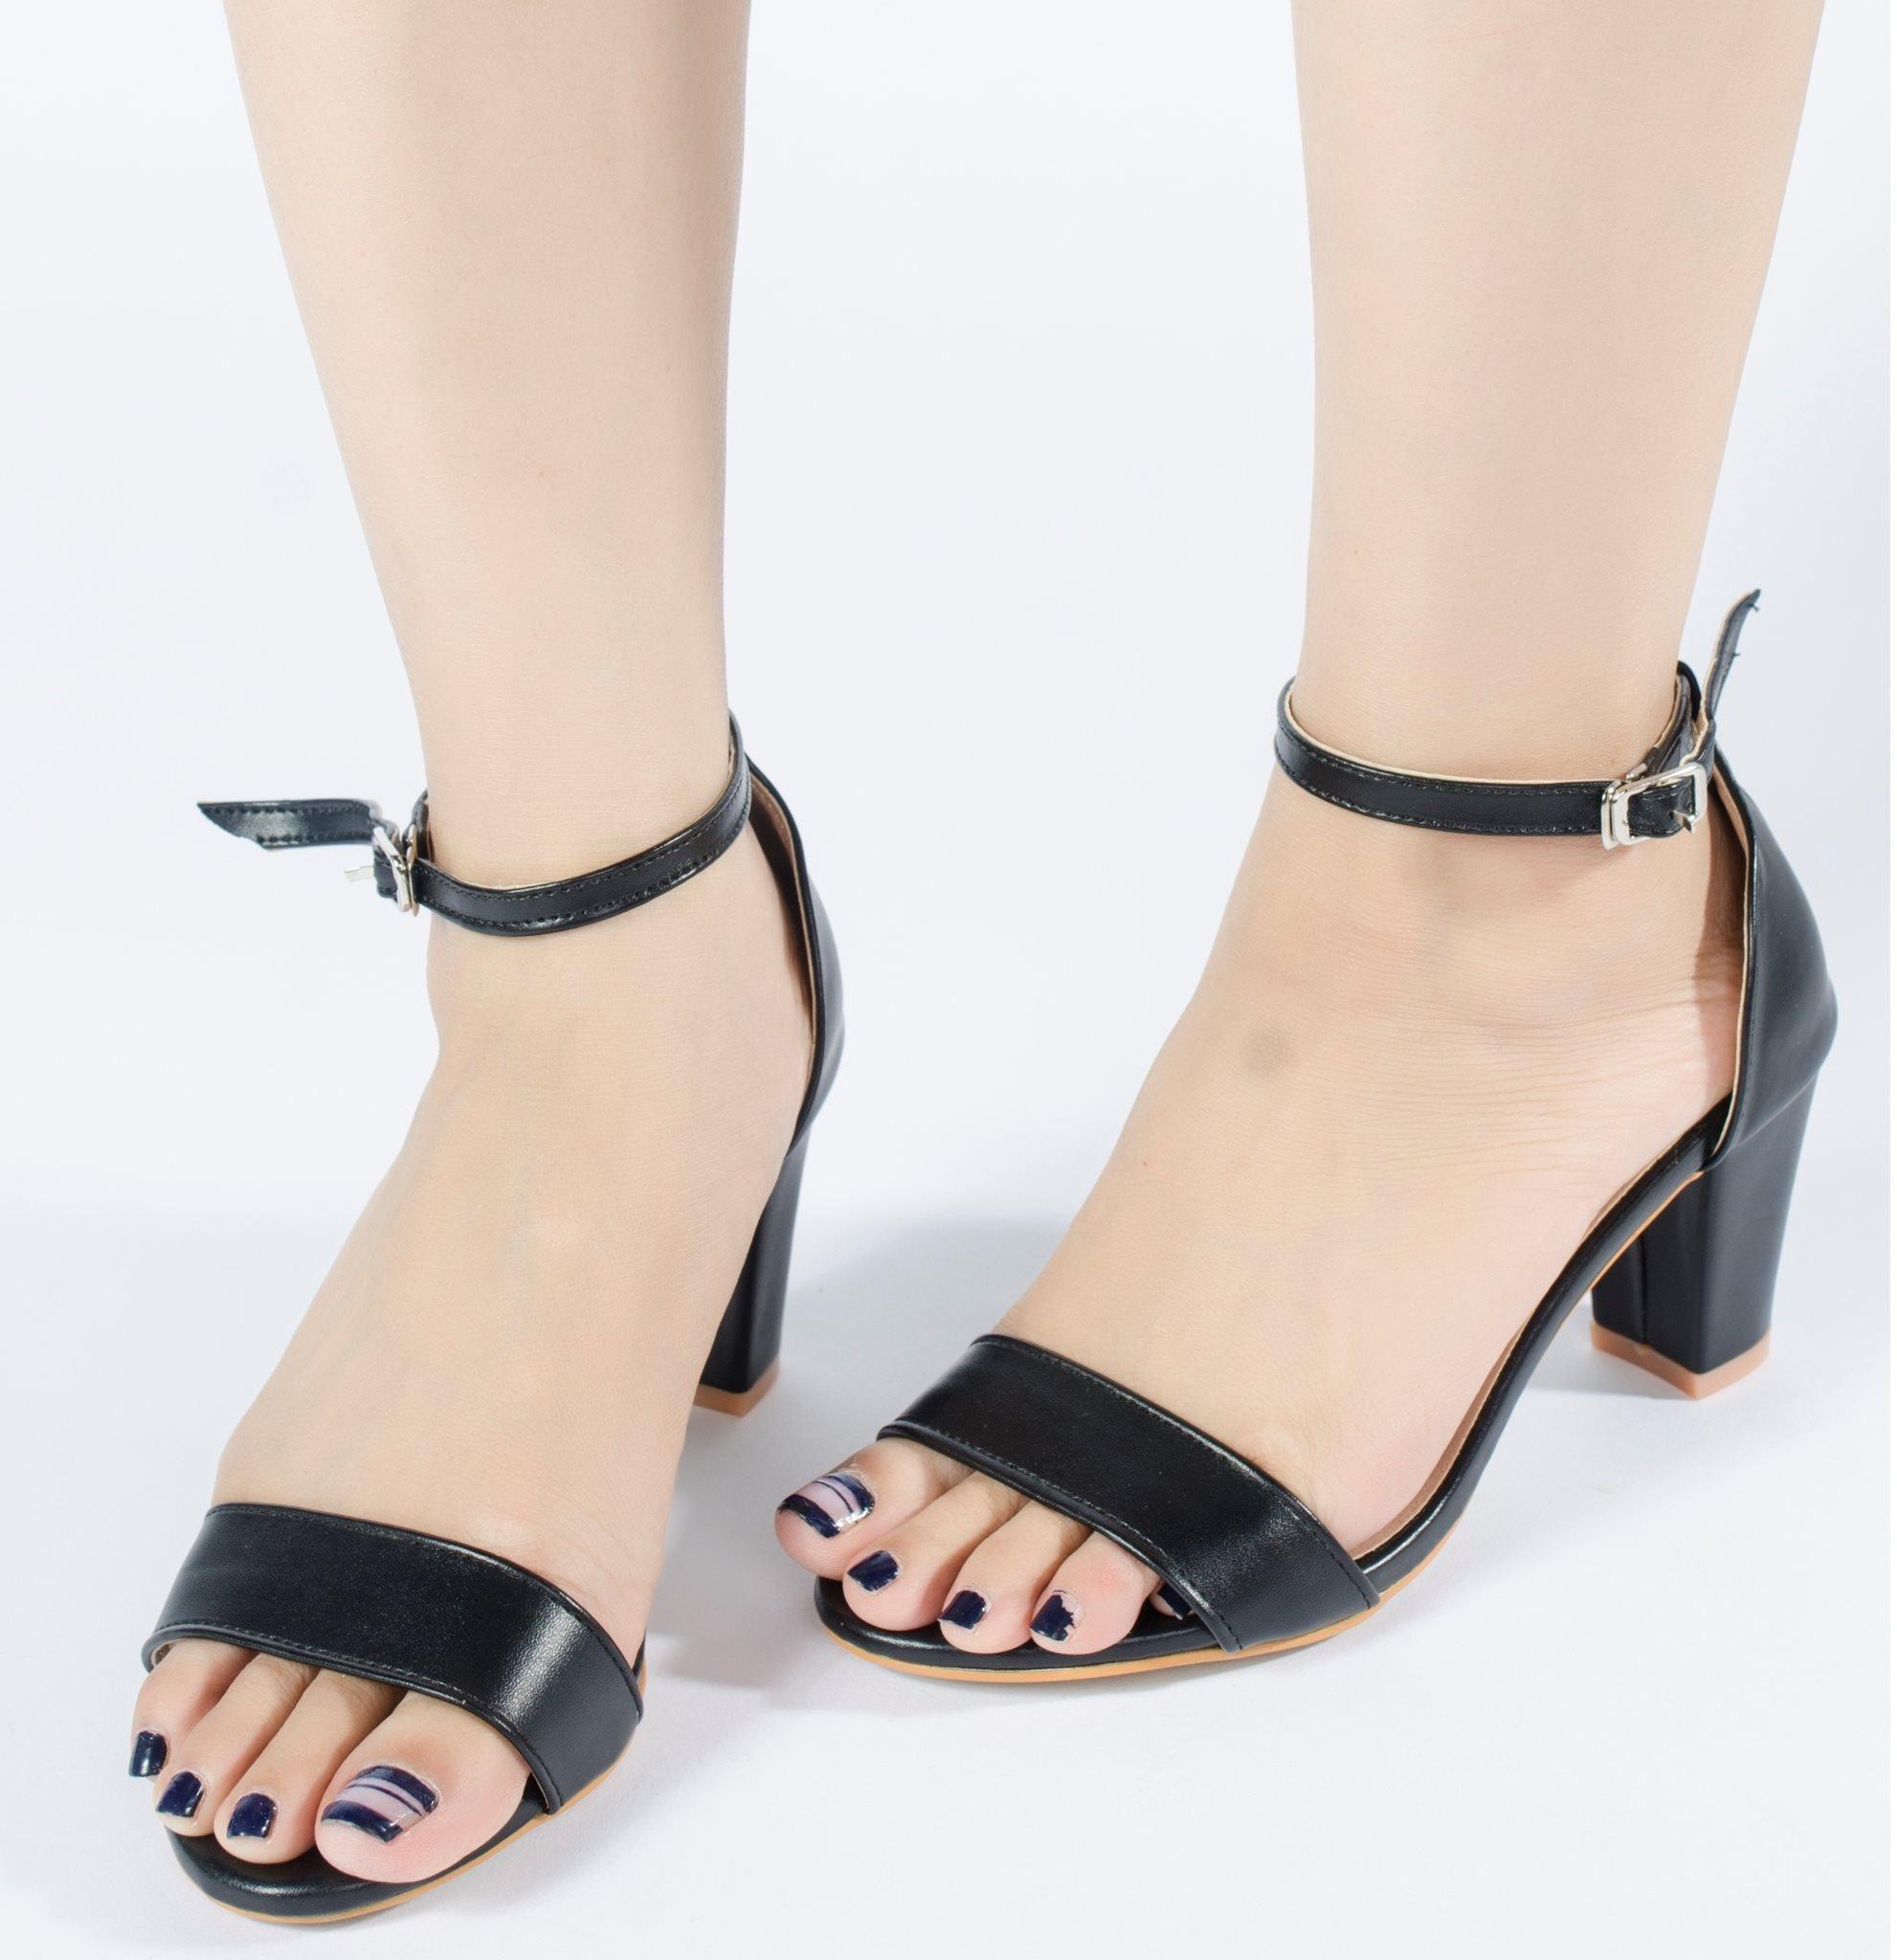 Giày cao gót MWC NUCG- 3504